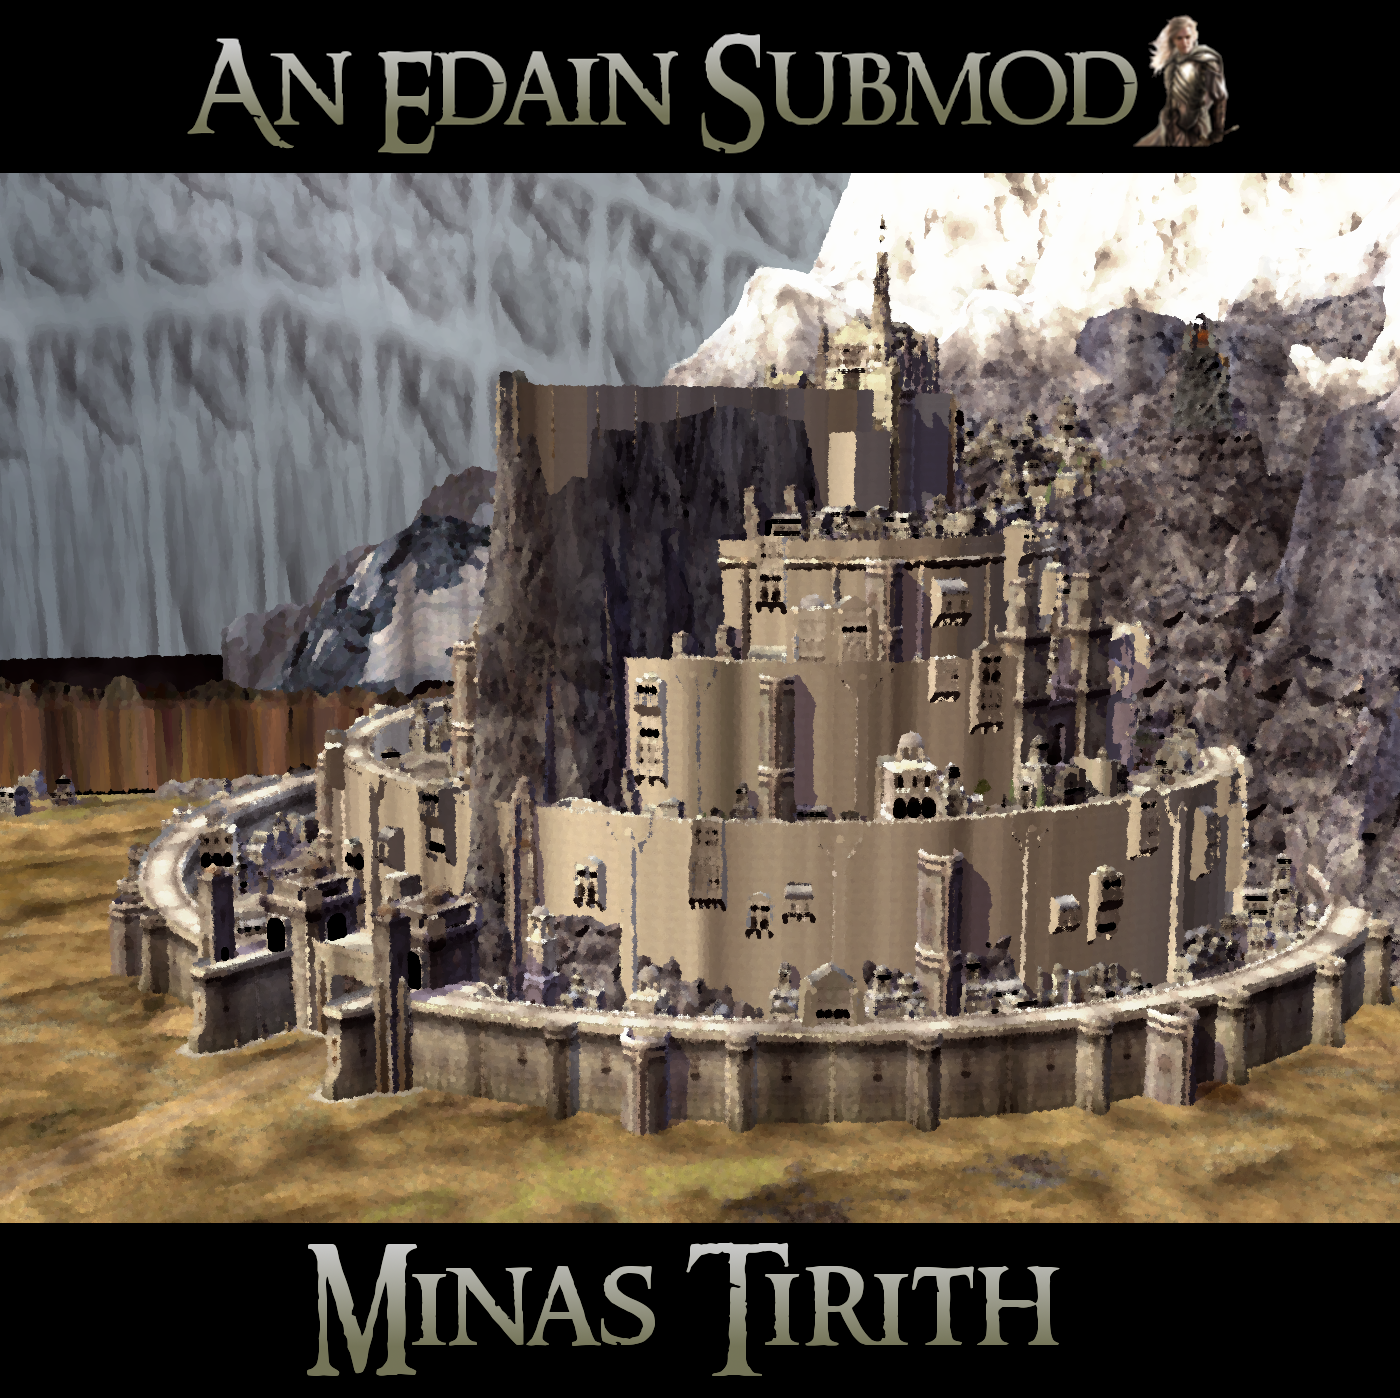 Minas Tirith NEW pic